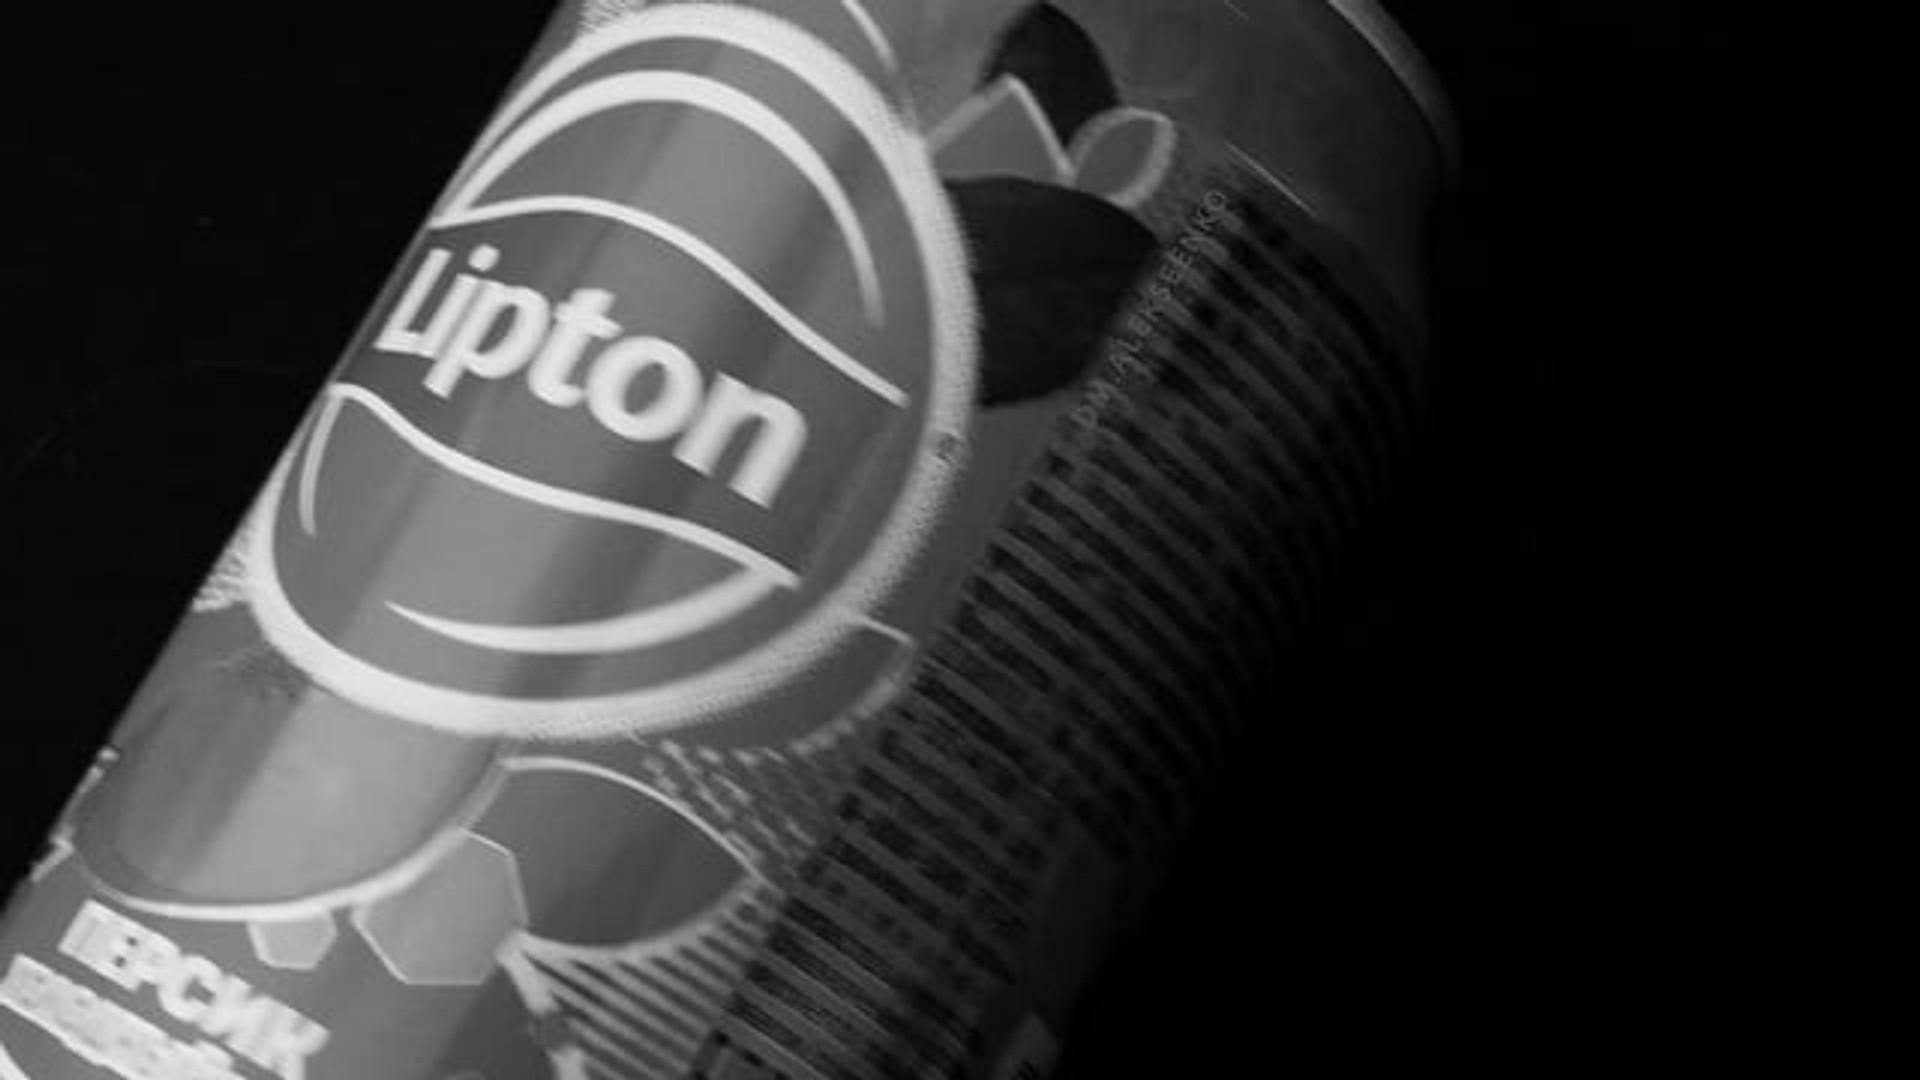 Проморолик Lipton ice tea